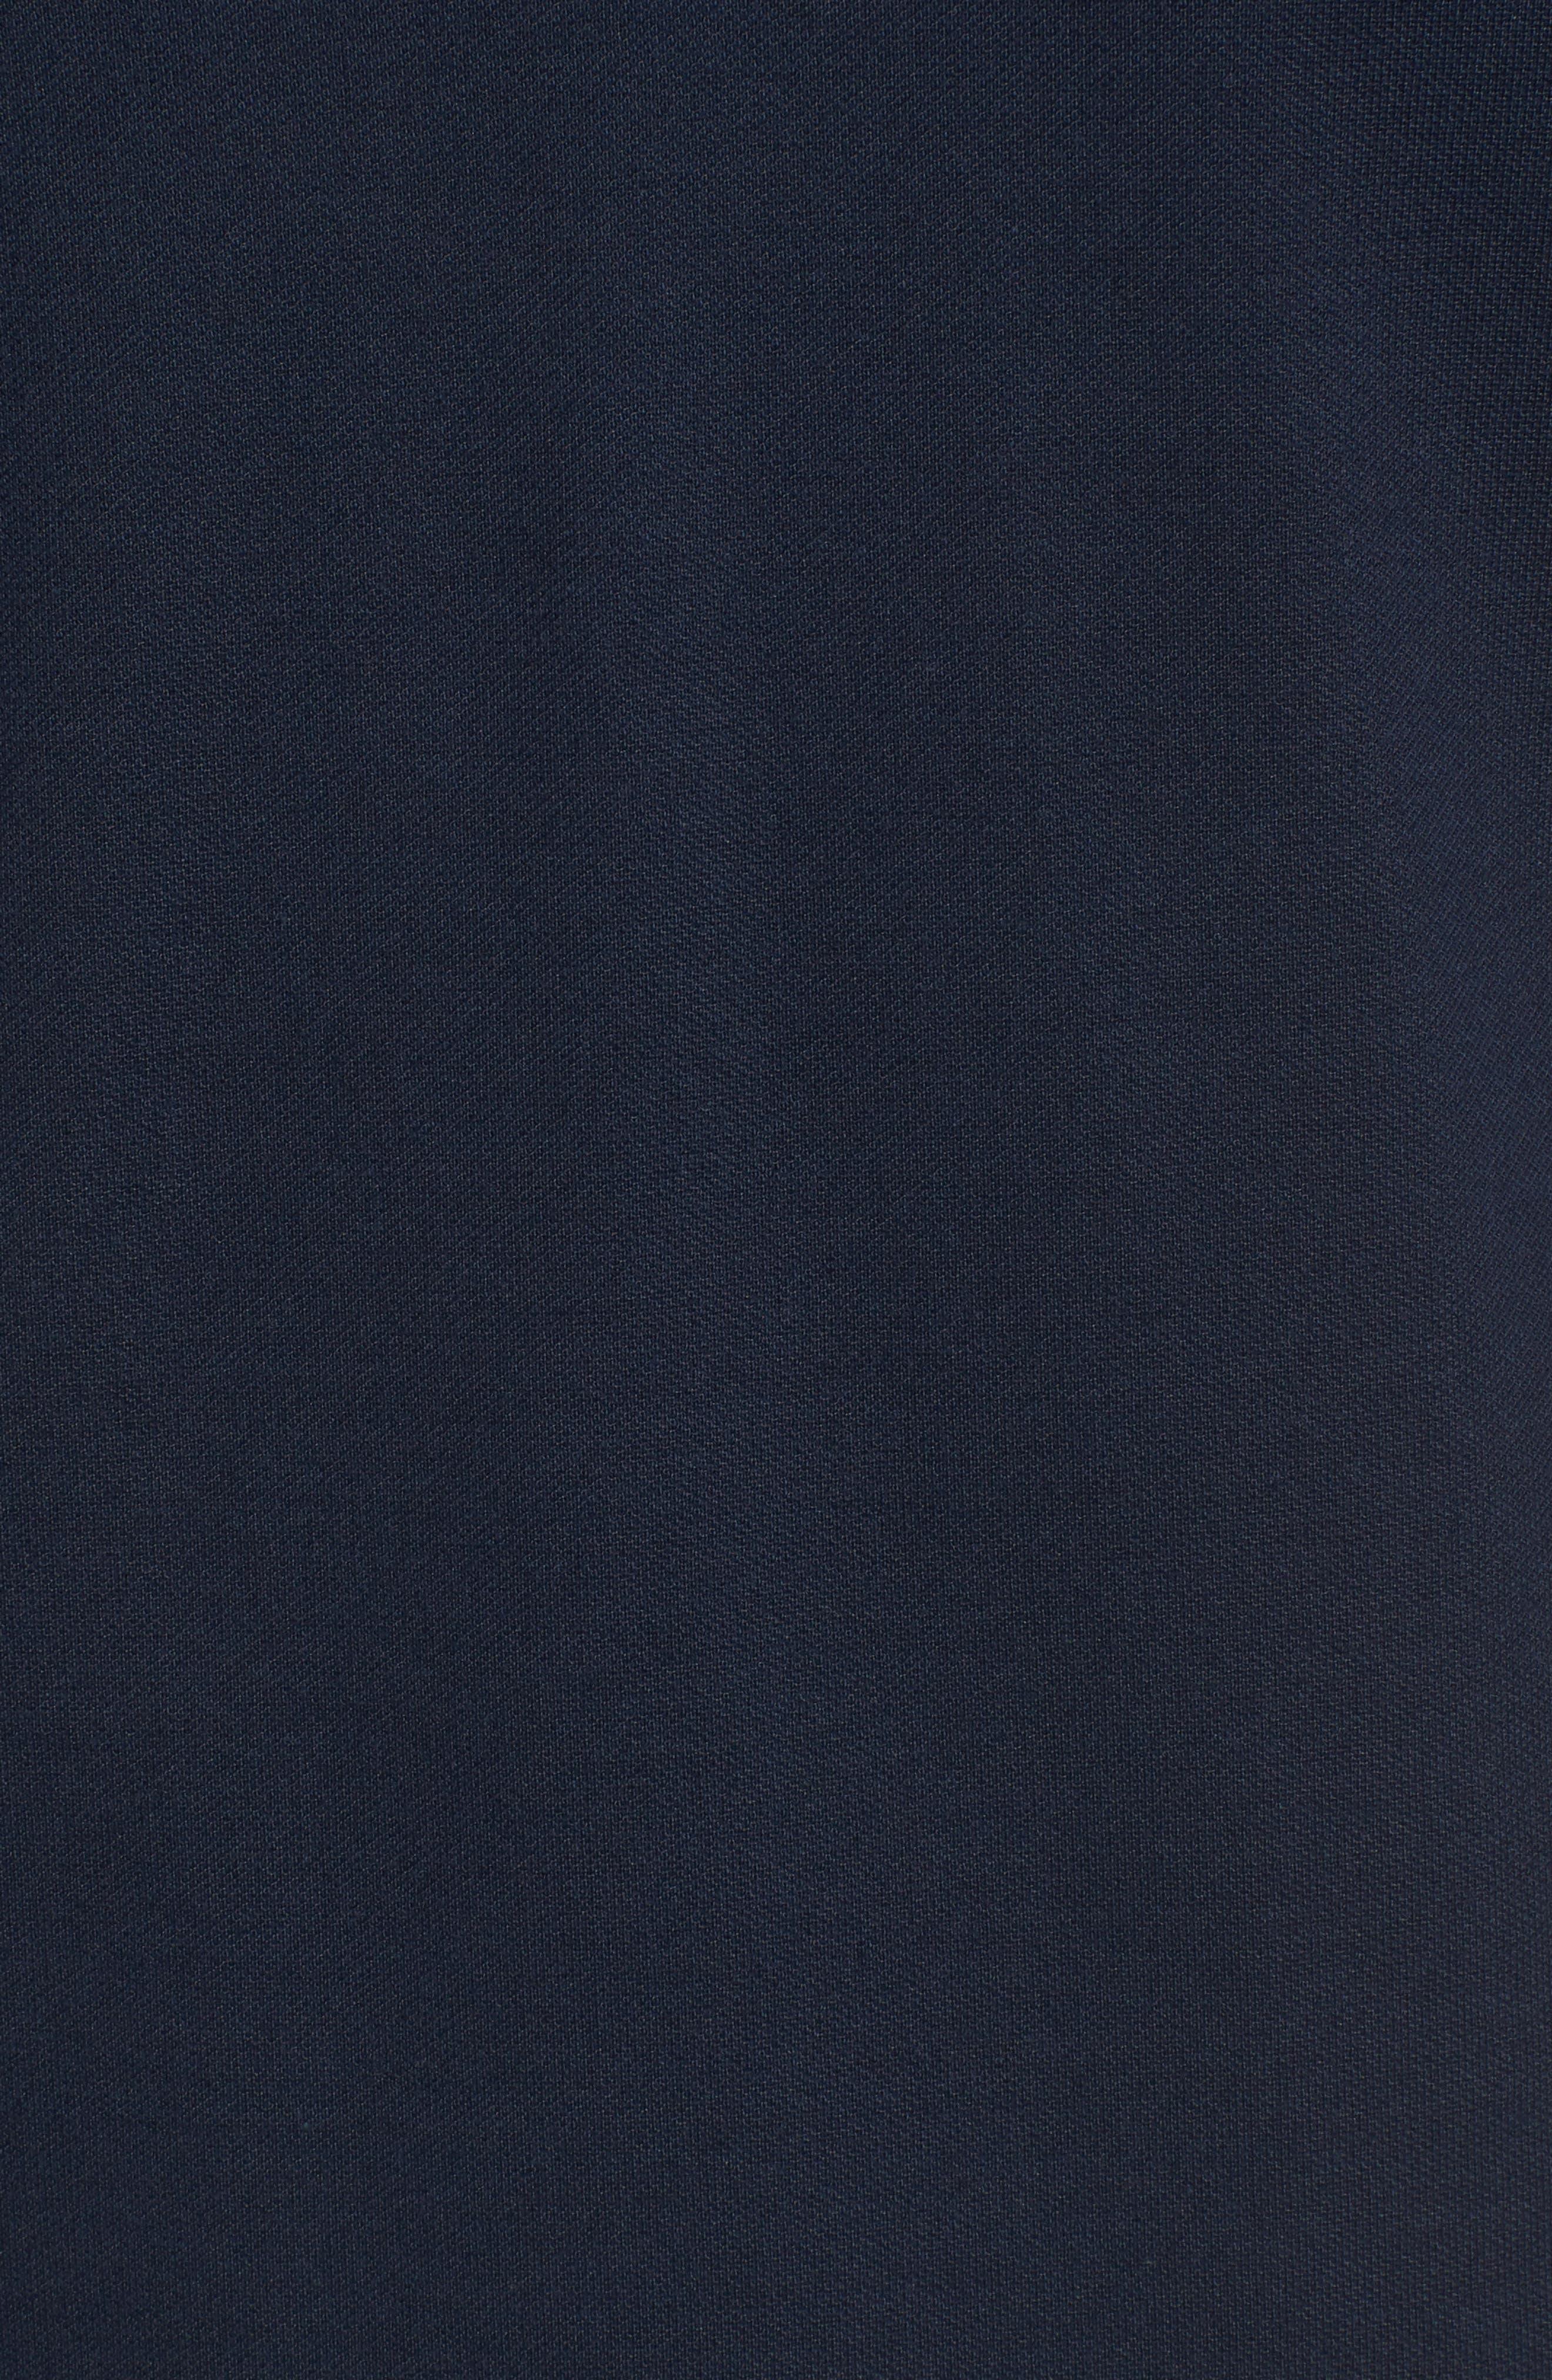 Made in France Colorblock Piqué Polo,                             Alternate thumbnail 15, color,